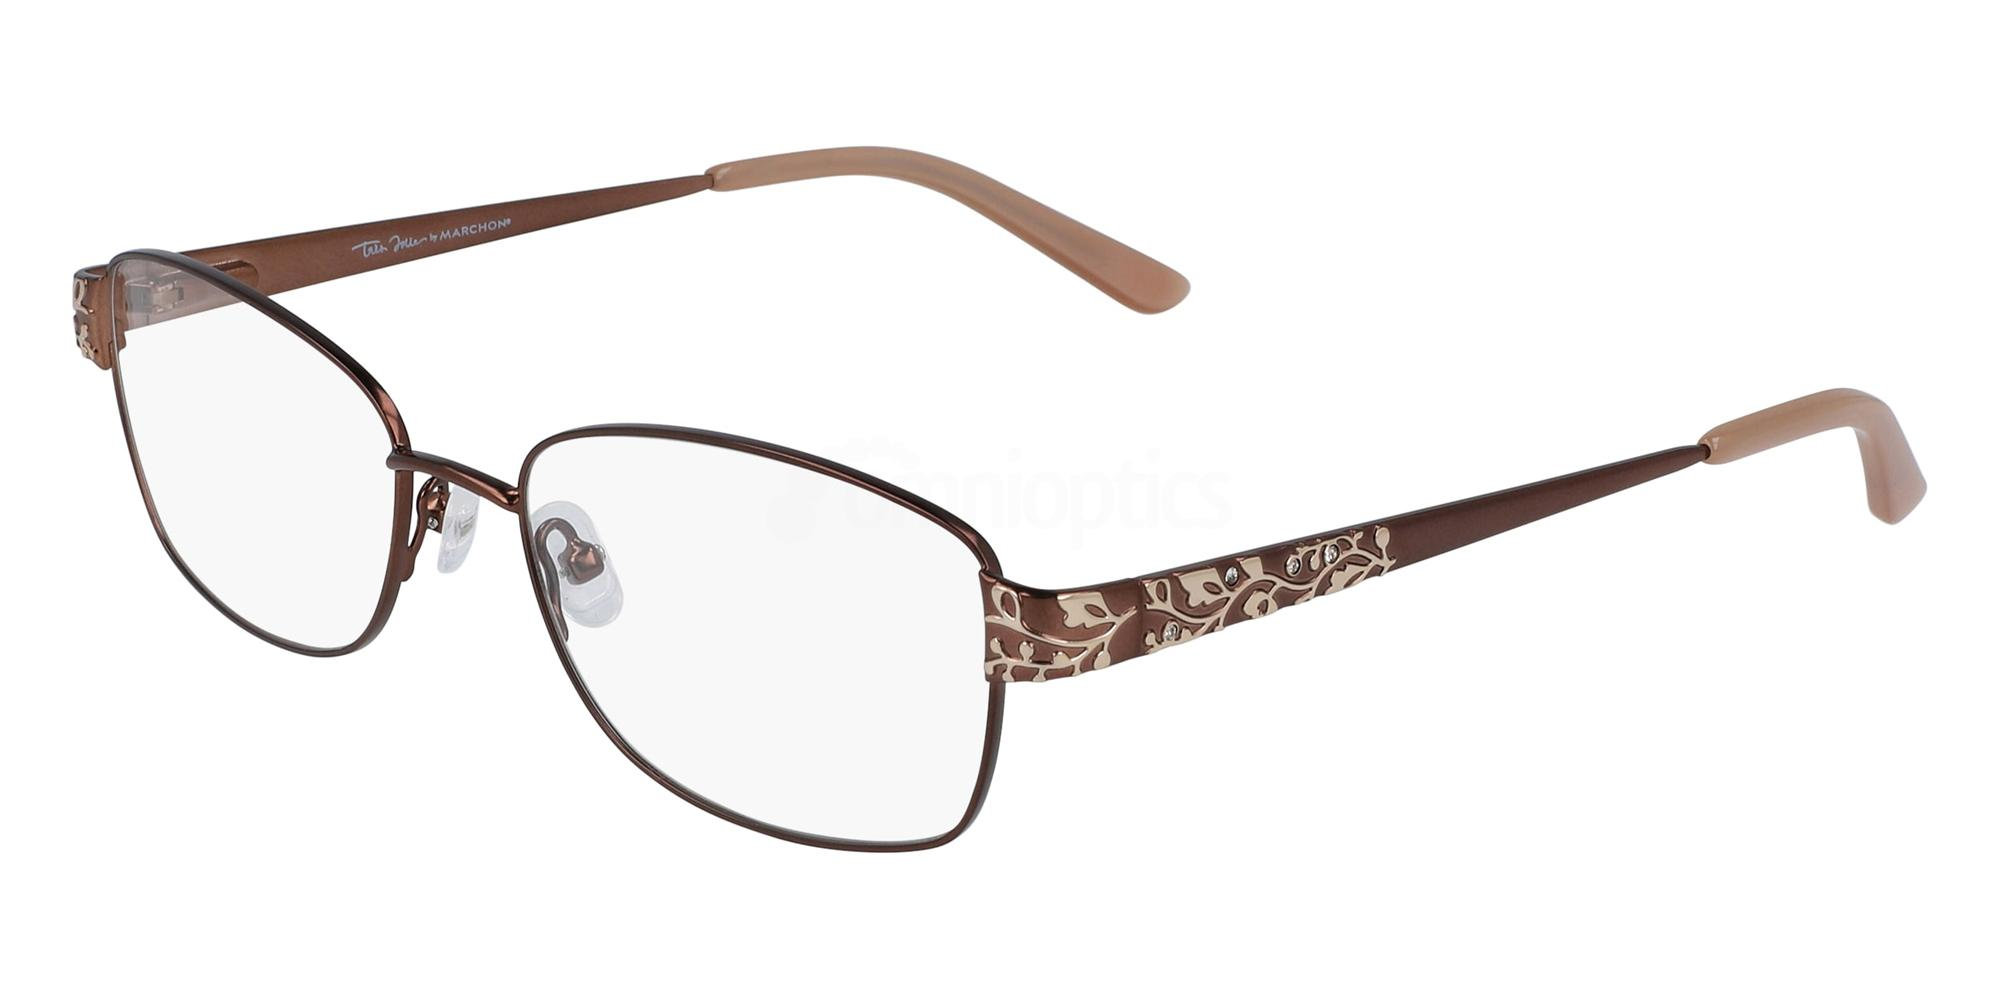 210 TRES JOLIE 189 Glasses, Tres Jolie